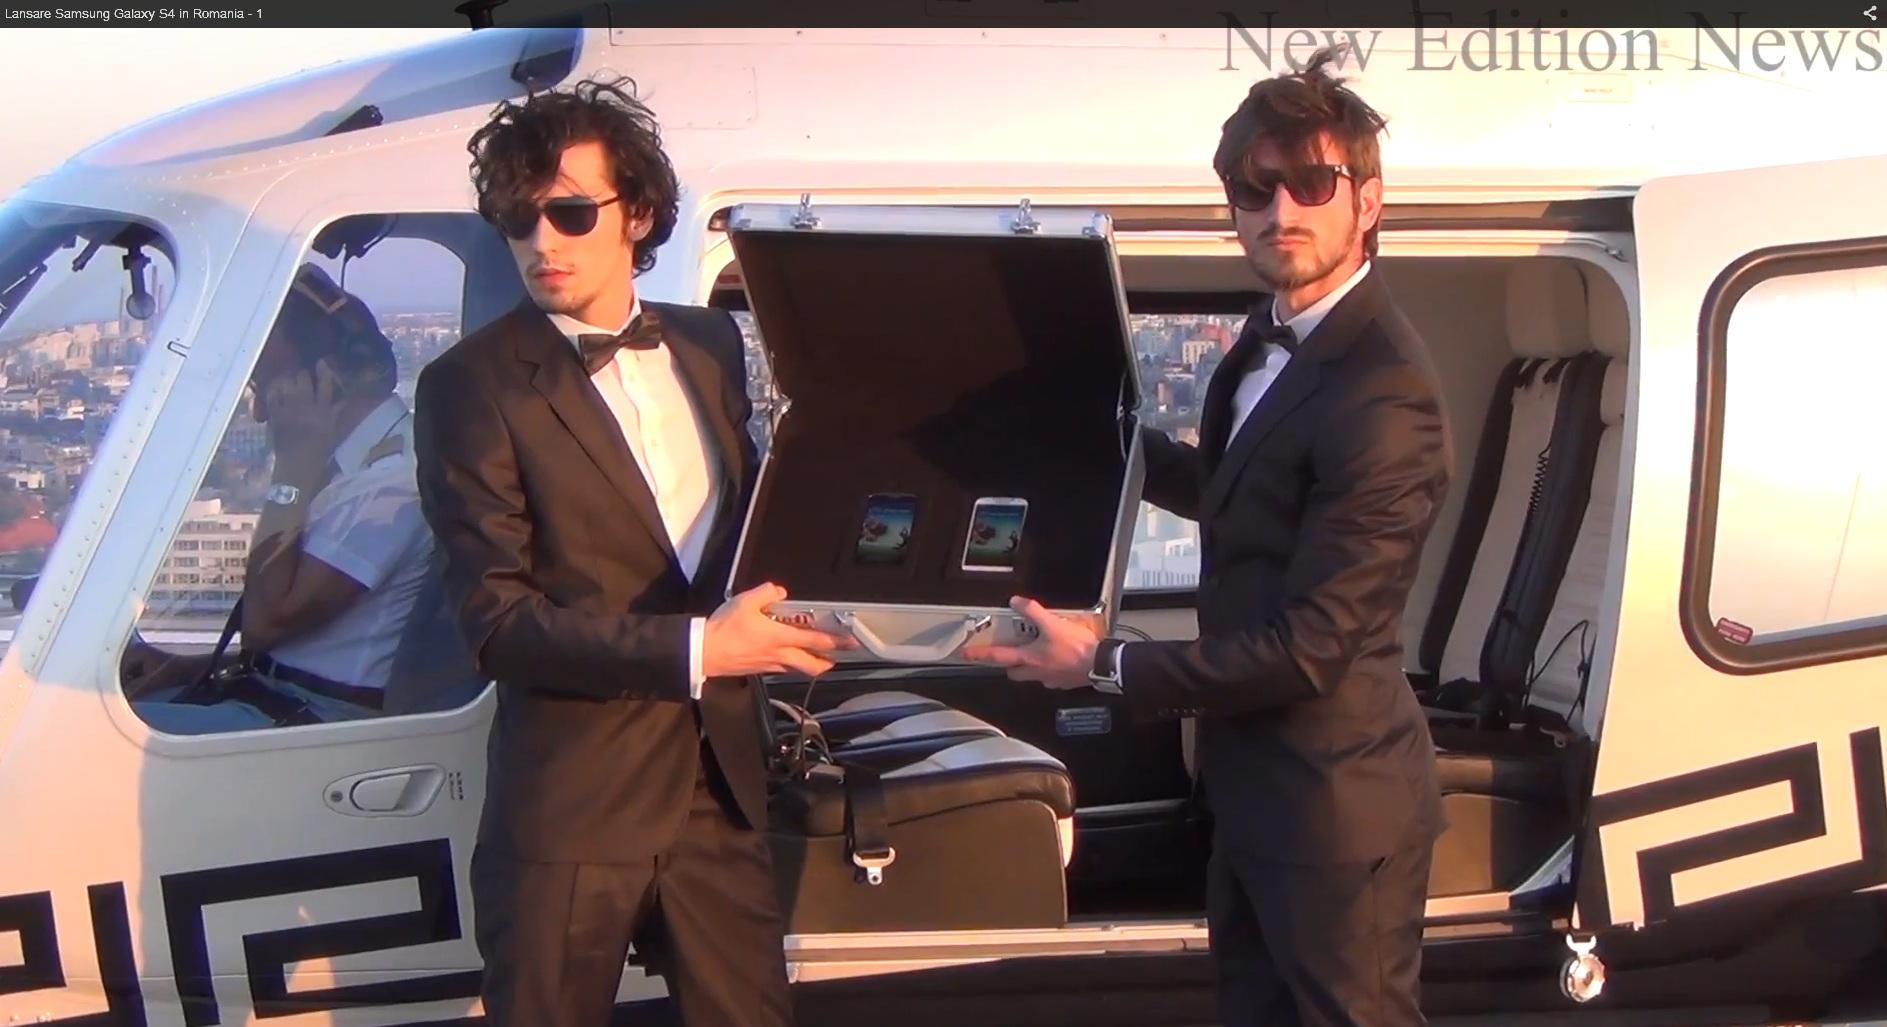 "Doi ""agenti secreti"" au pazit valiza care ascundea telefonul"